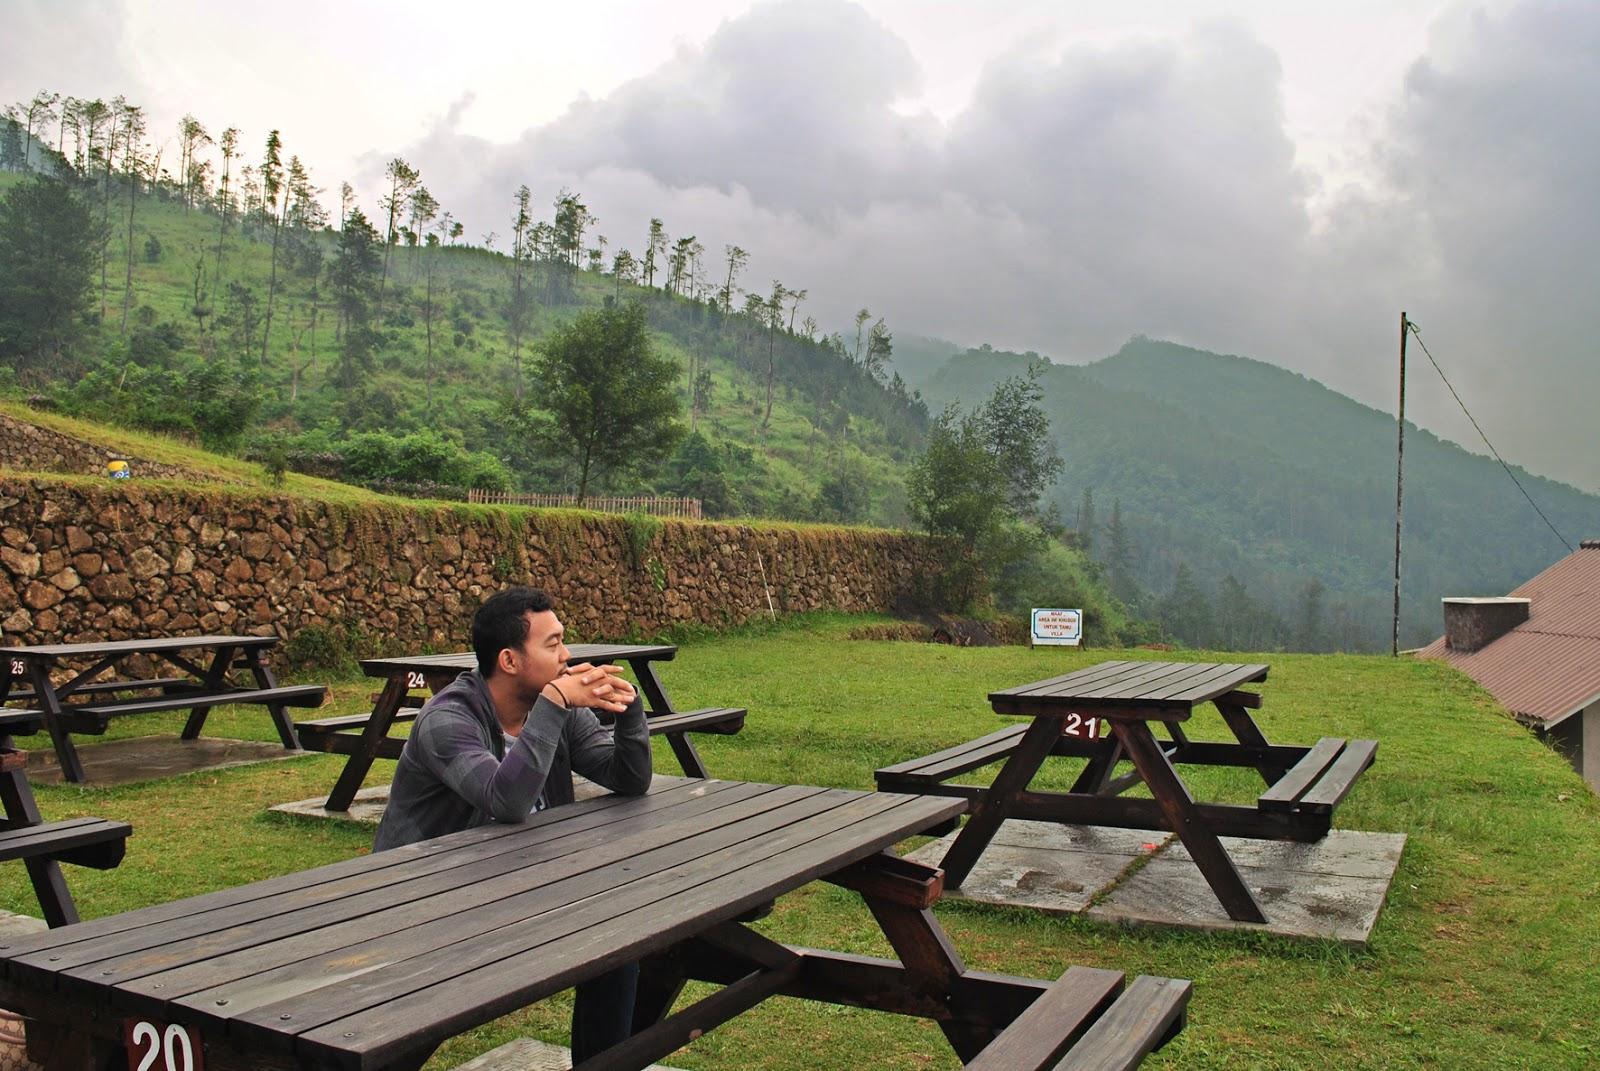 9 Tempat Wisata Bernuansa Alam Pegunungan di Semarang. Ngadem Yuk  Yuk Piknik